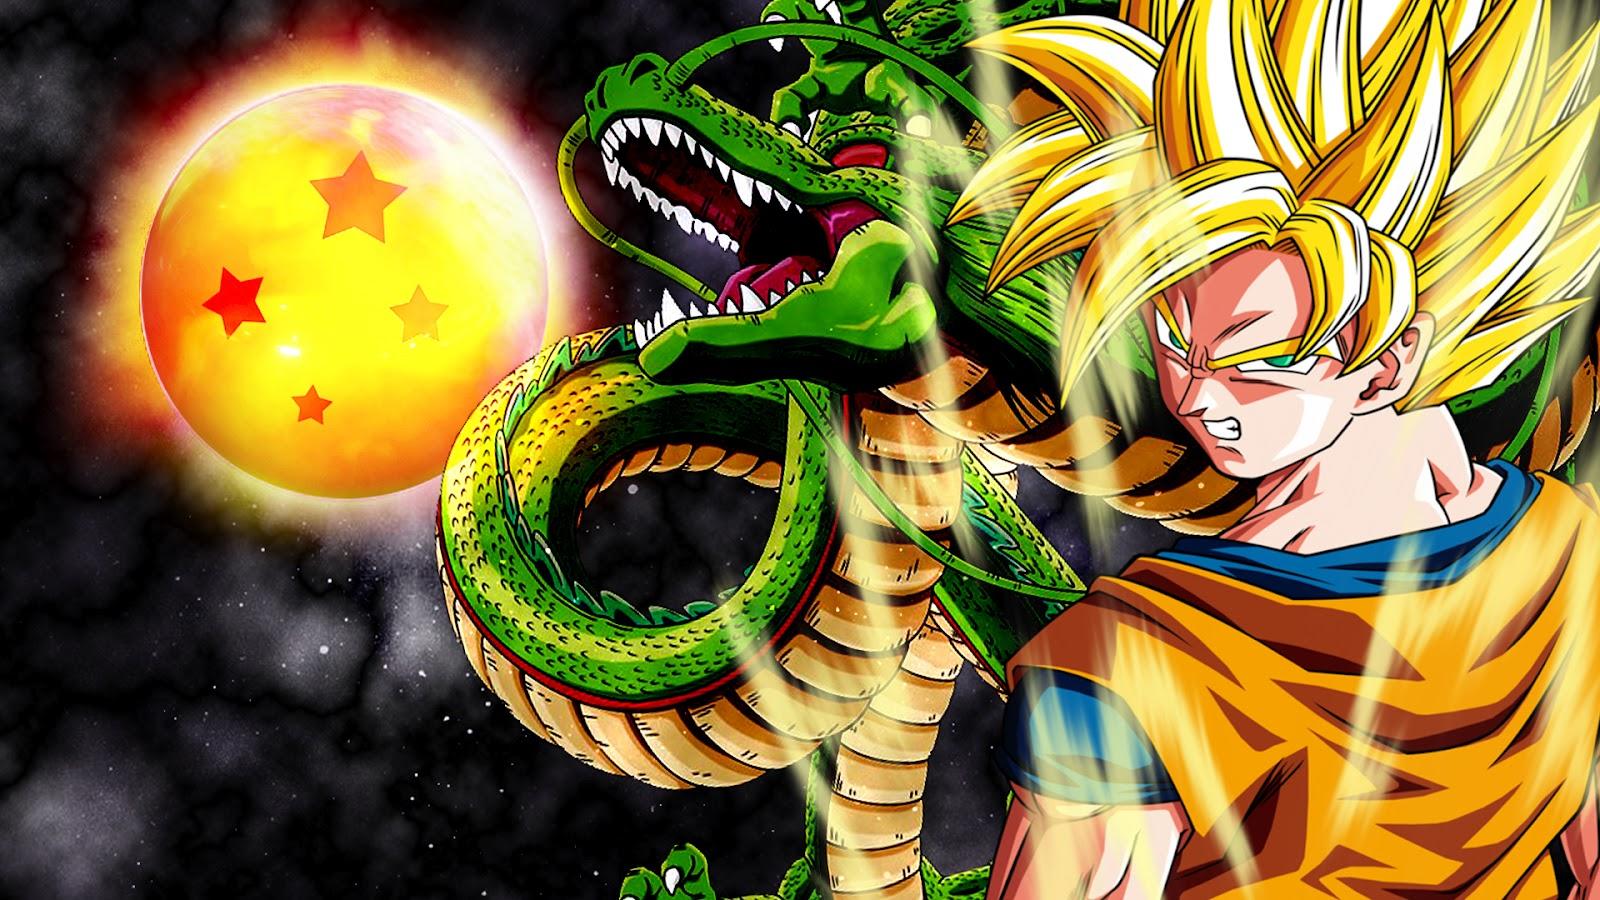 Goku Super Saiyan Wallpaper Hd Sf Wallpaper